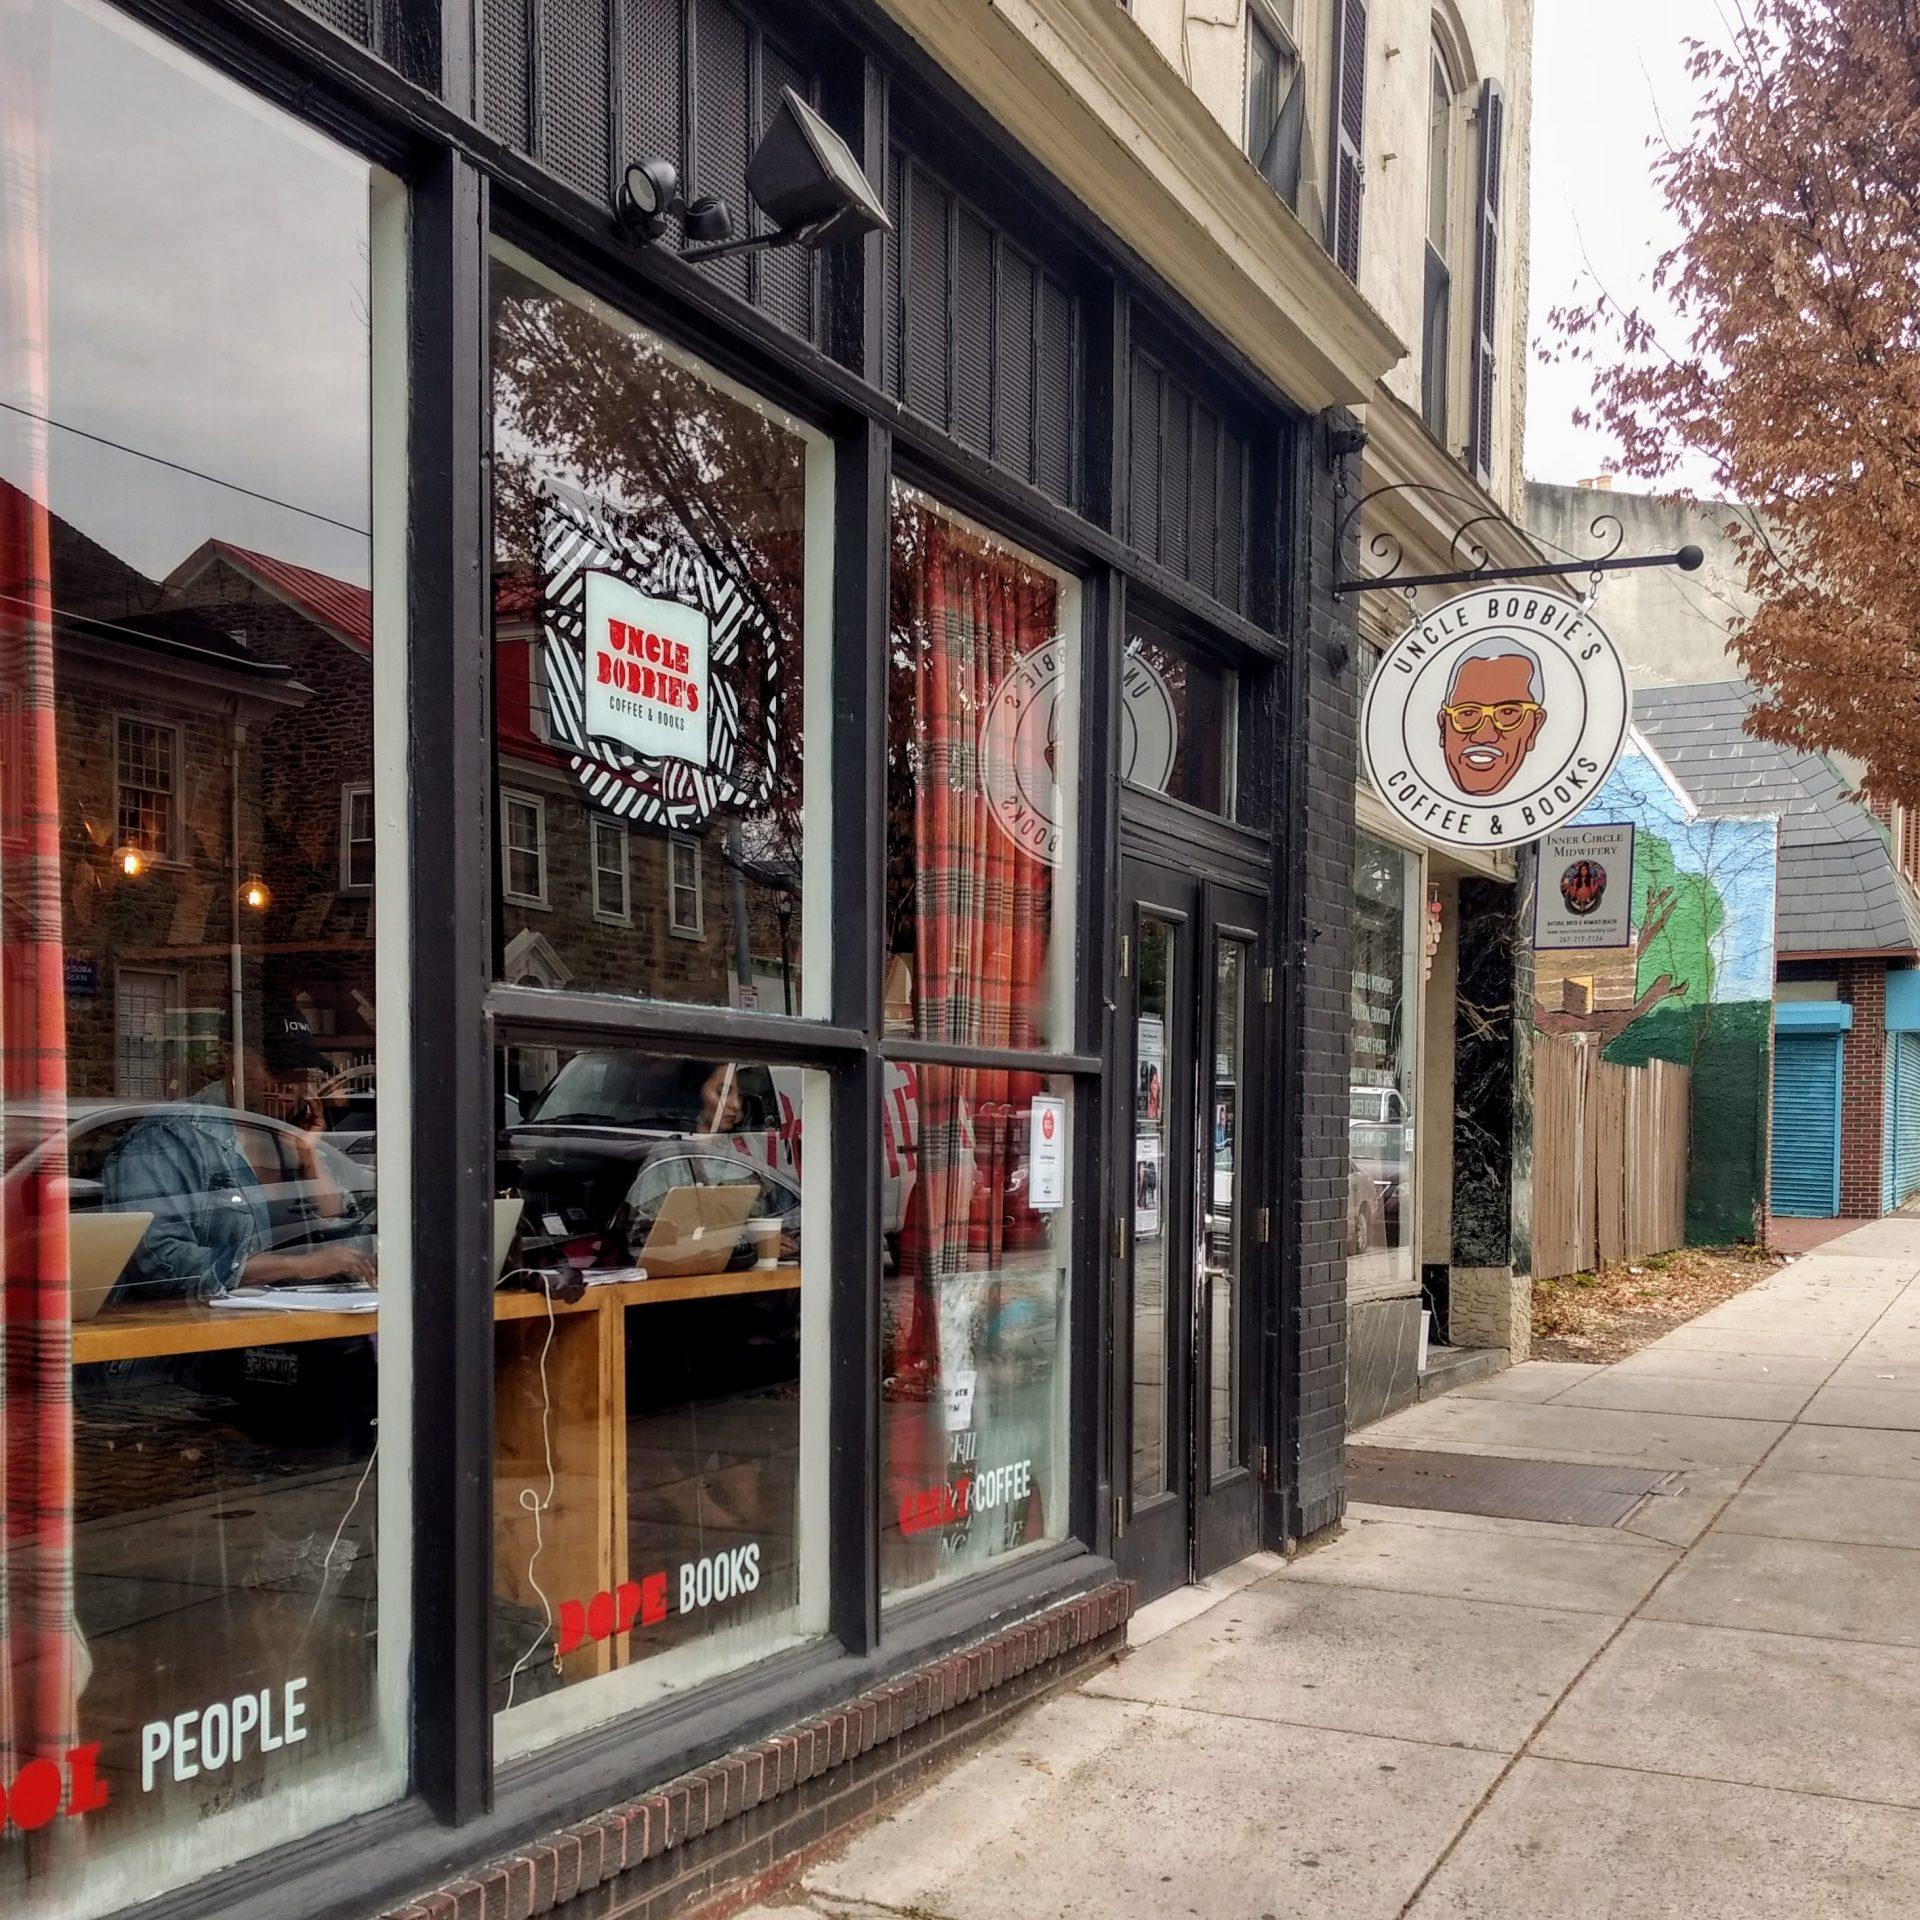 Uncle Bobbie's Coffee & Books in Germantown. (